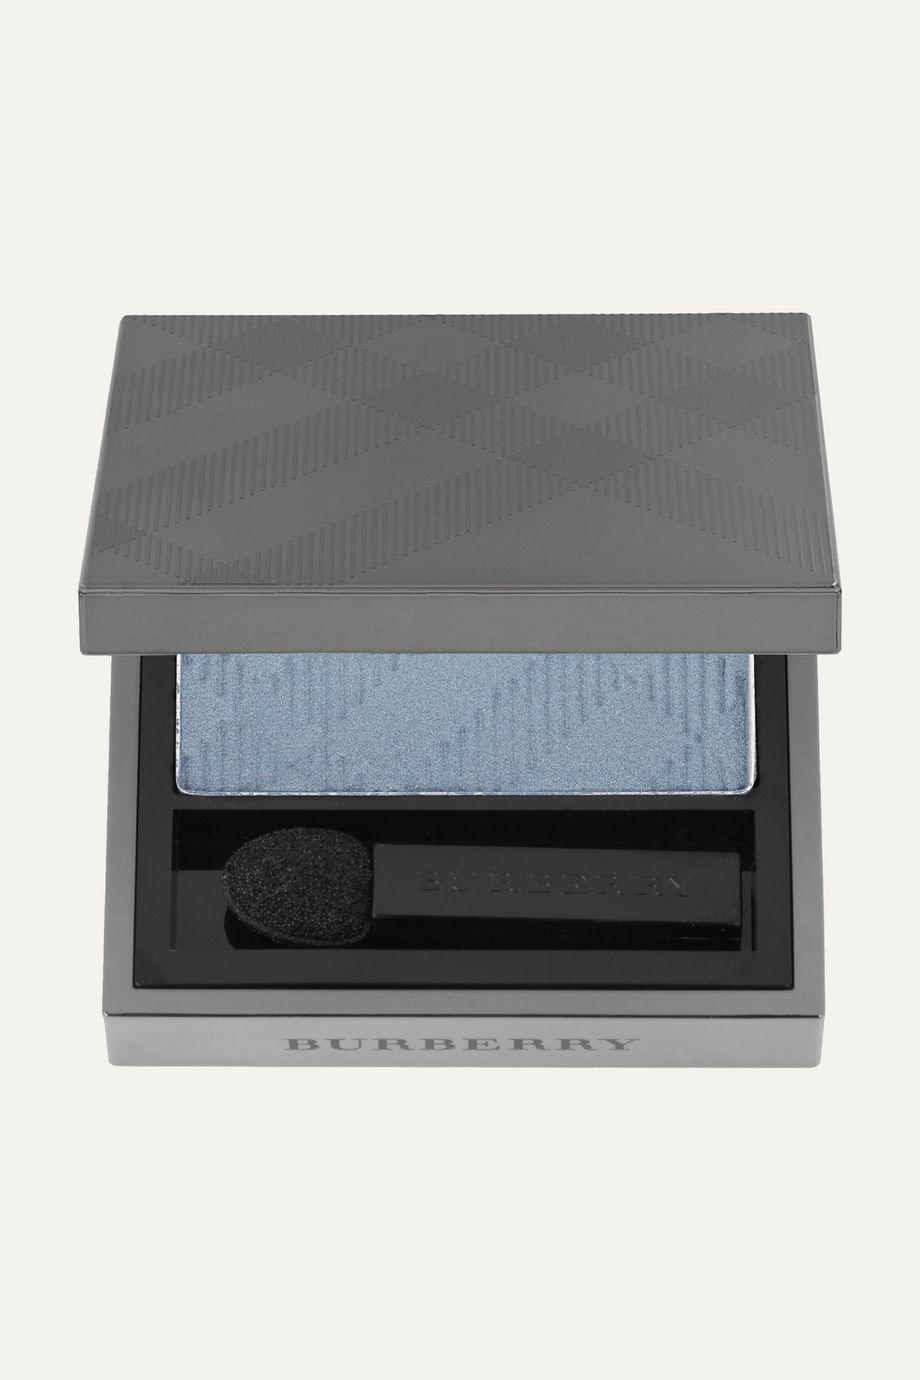 Burberry Beauty Wet & Dry Silk Eye Shadow - Stone Blue No.307